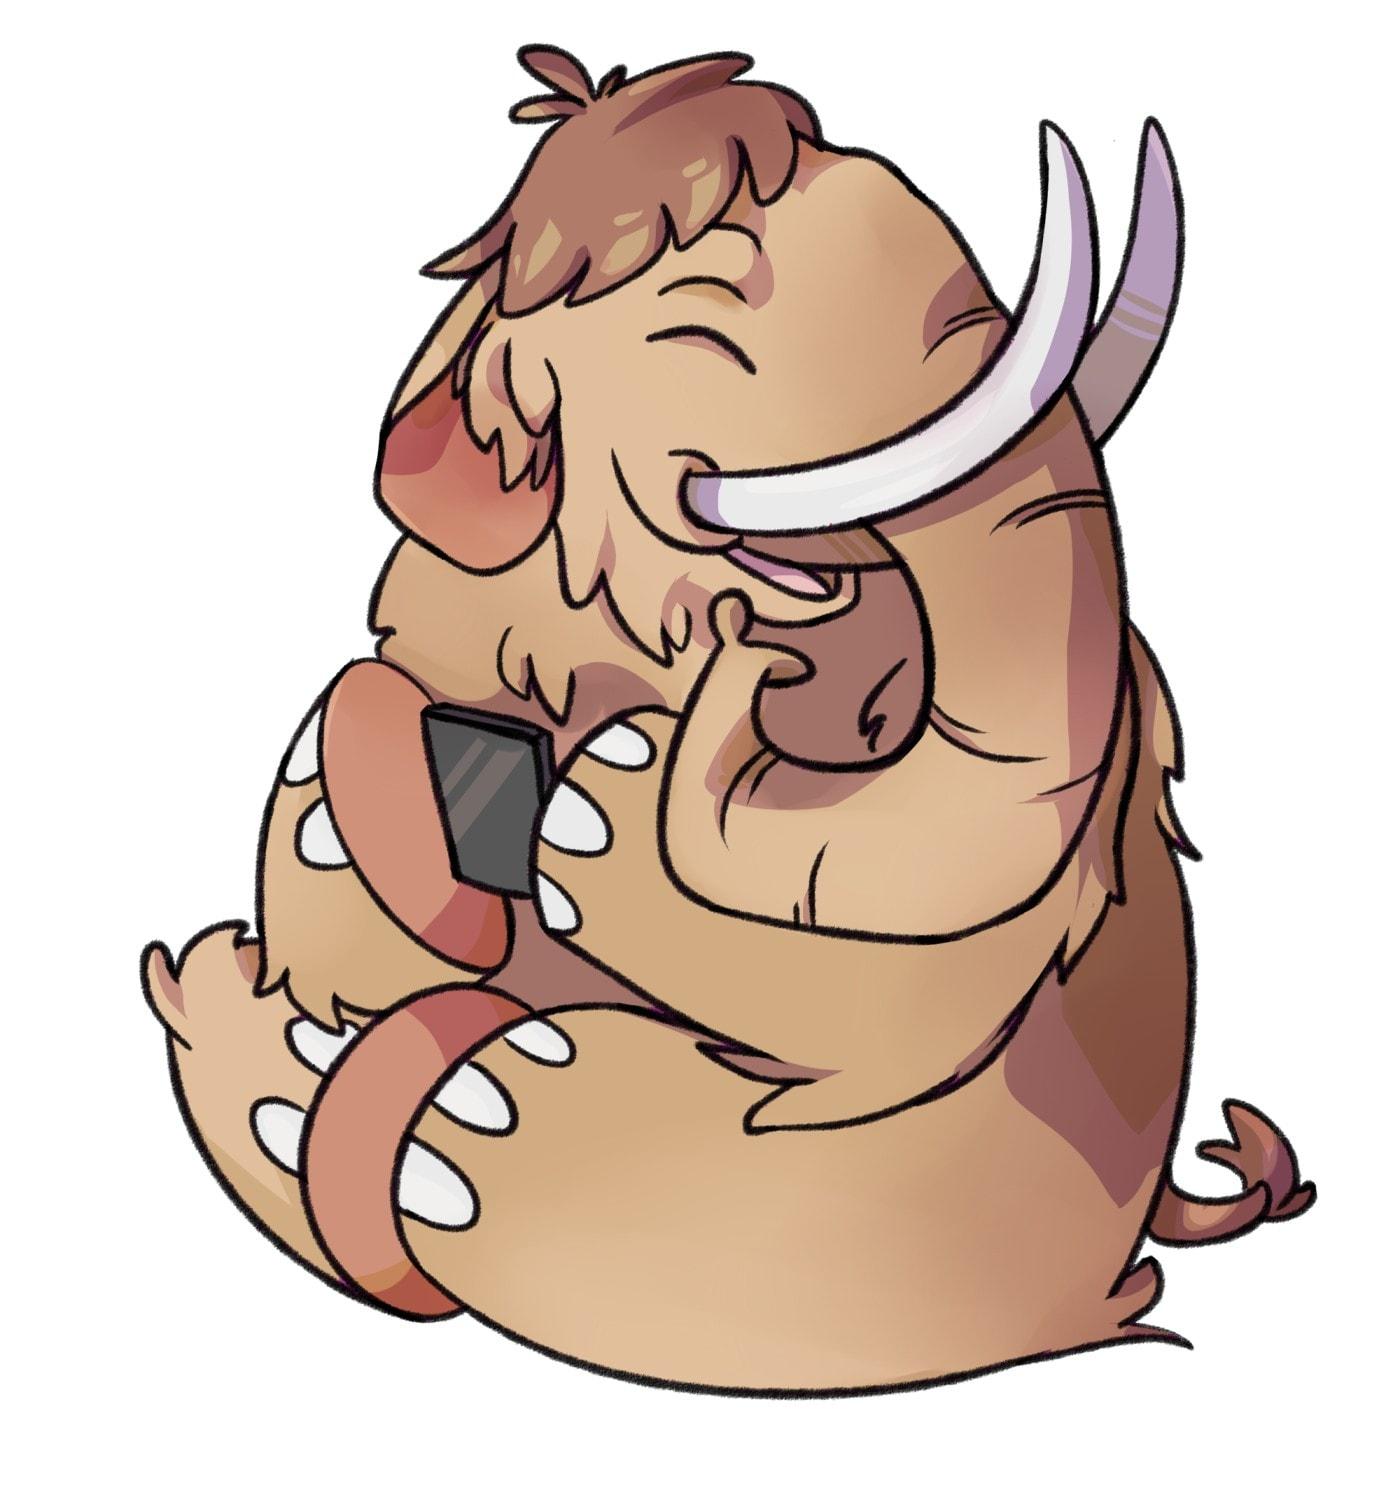 Mastodon calls itself